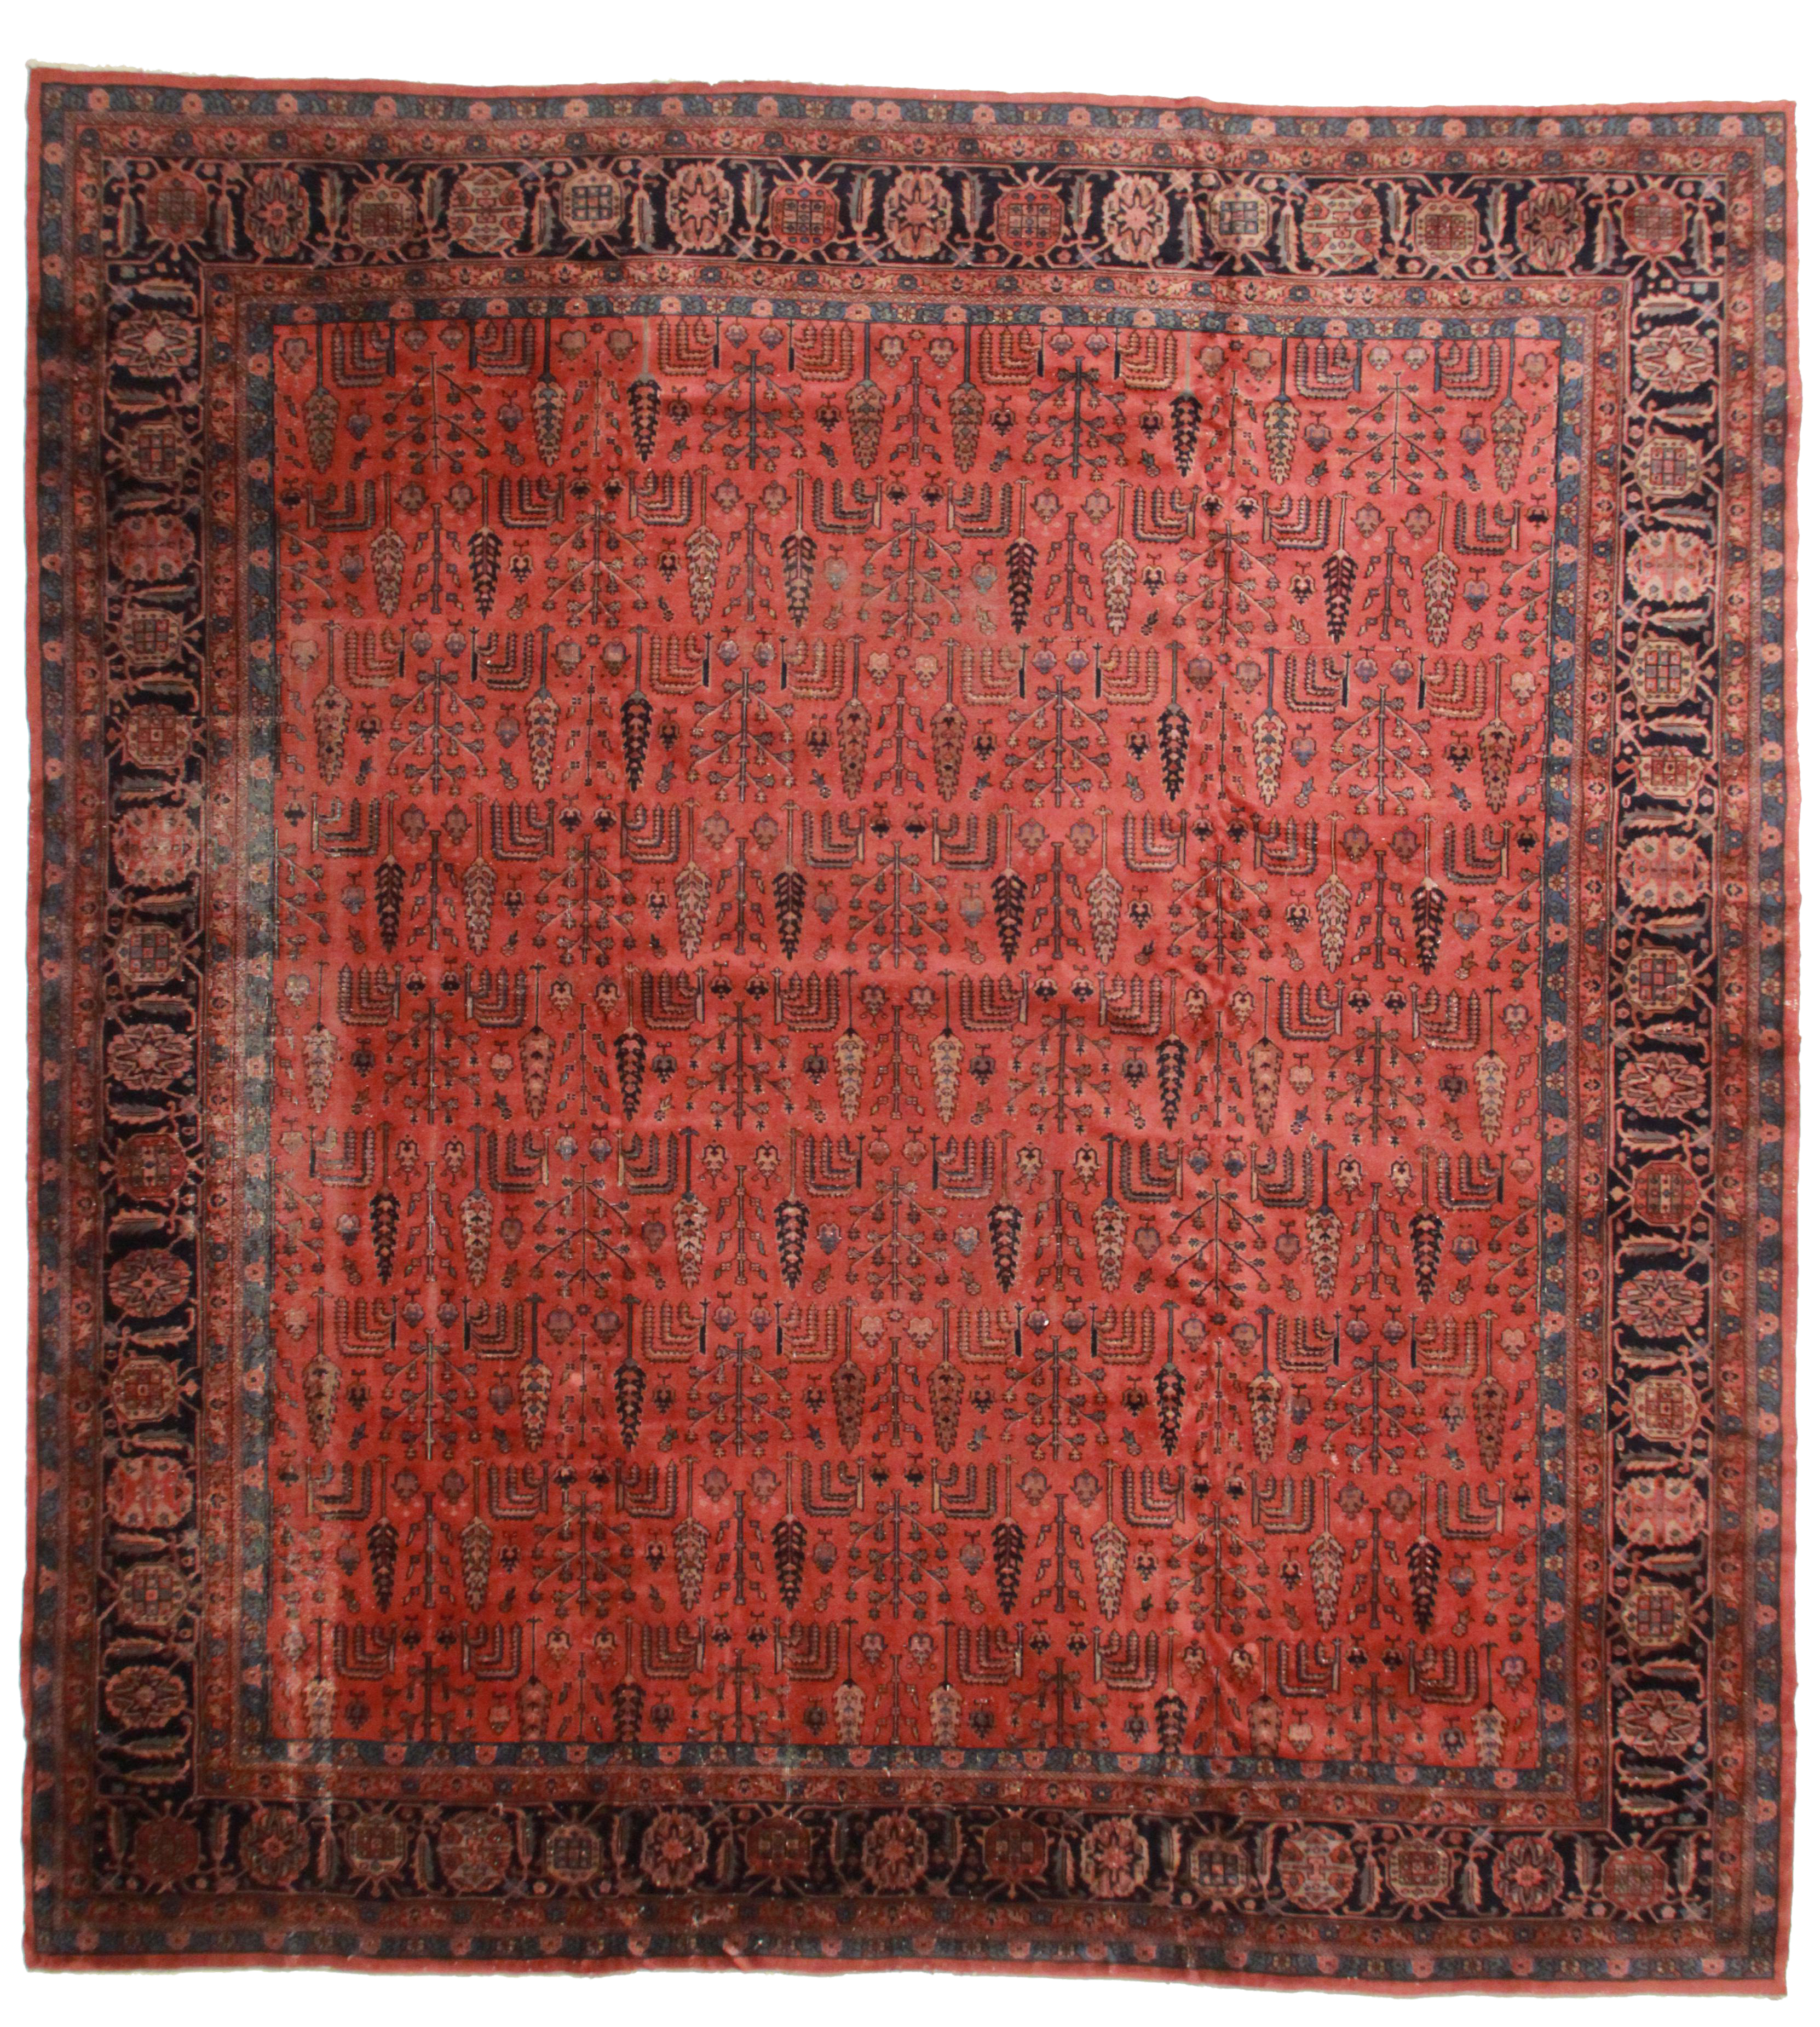 Delightful RugsinDallas Antique Turkish Sparta Hand Knotted Wool Rug  14u20323u2033 × 15u2032